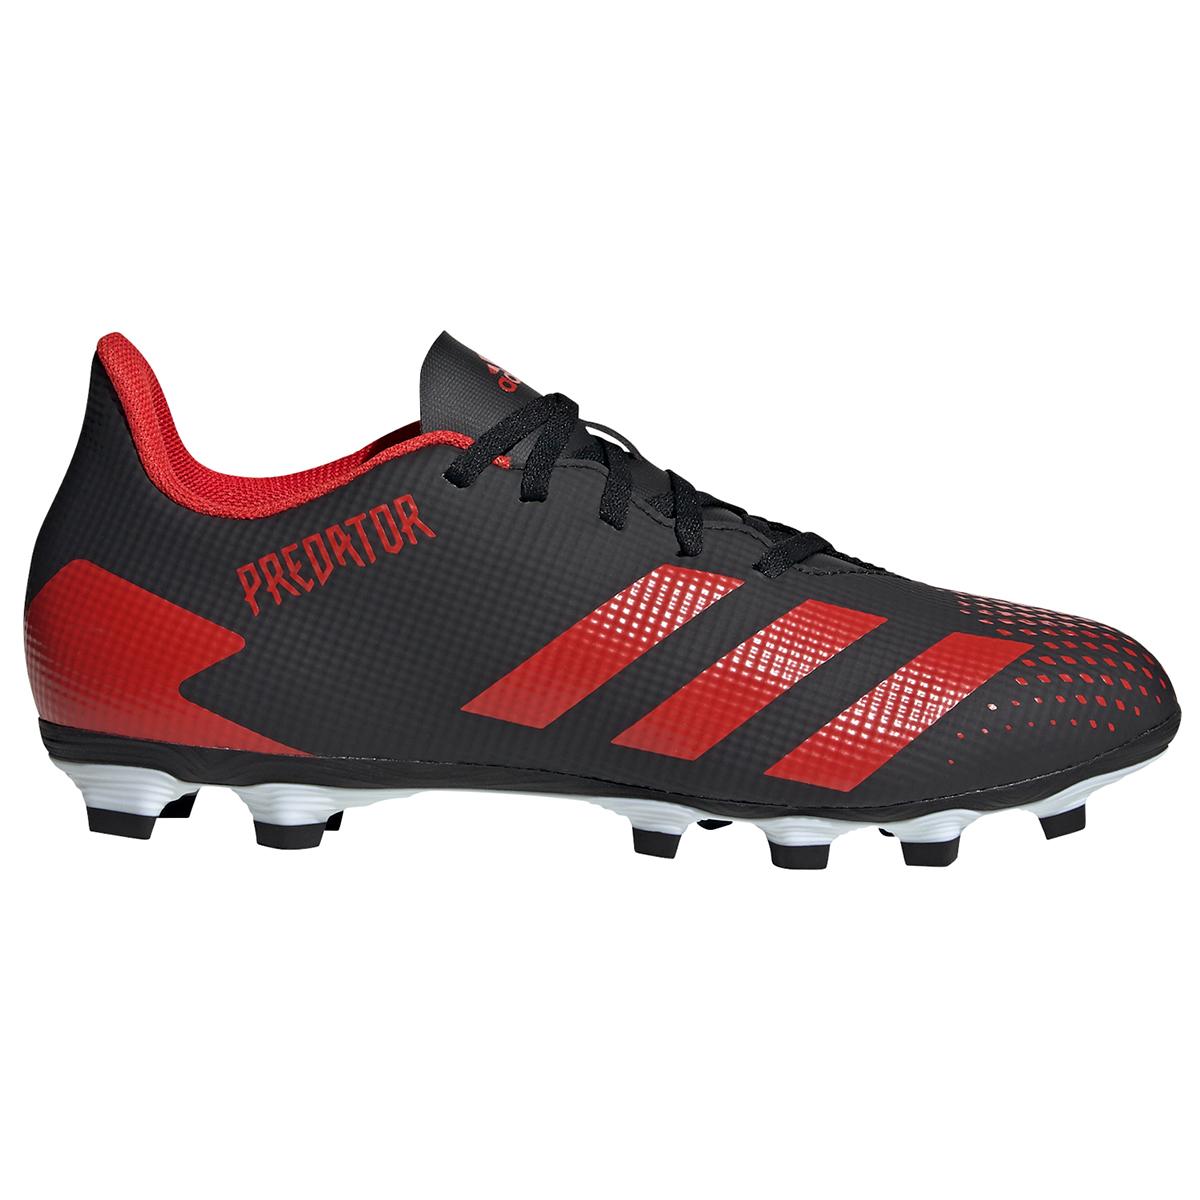 Adidas Predator 20.4 Flexible Ground Cleats